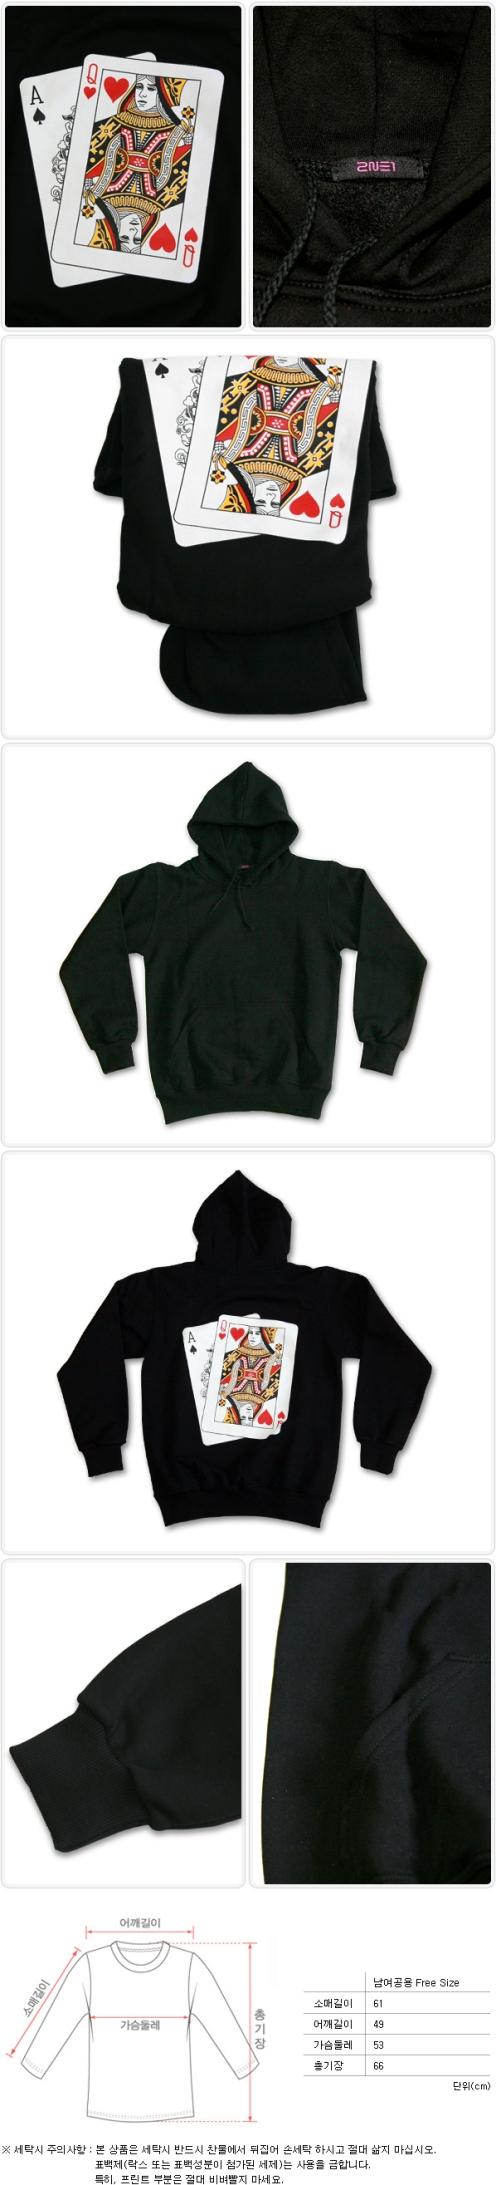 2NE1_T-shirts_hood